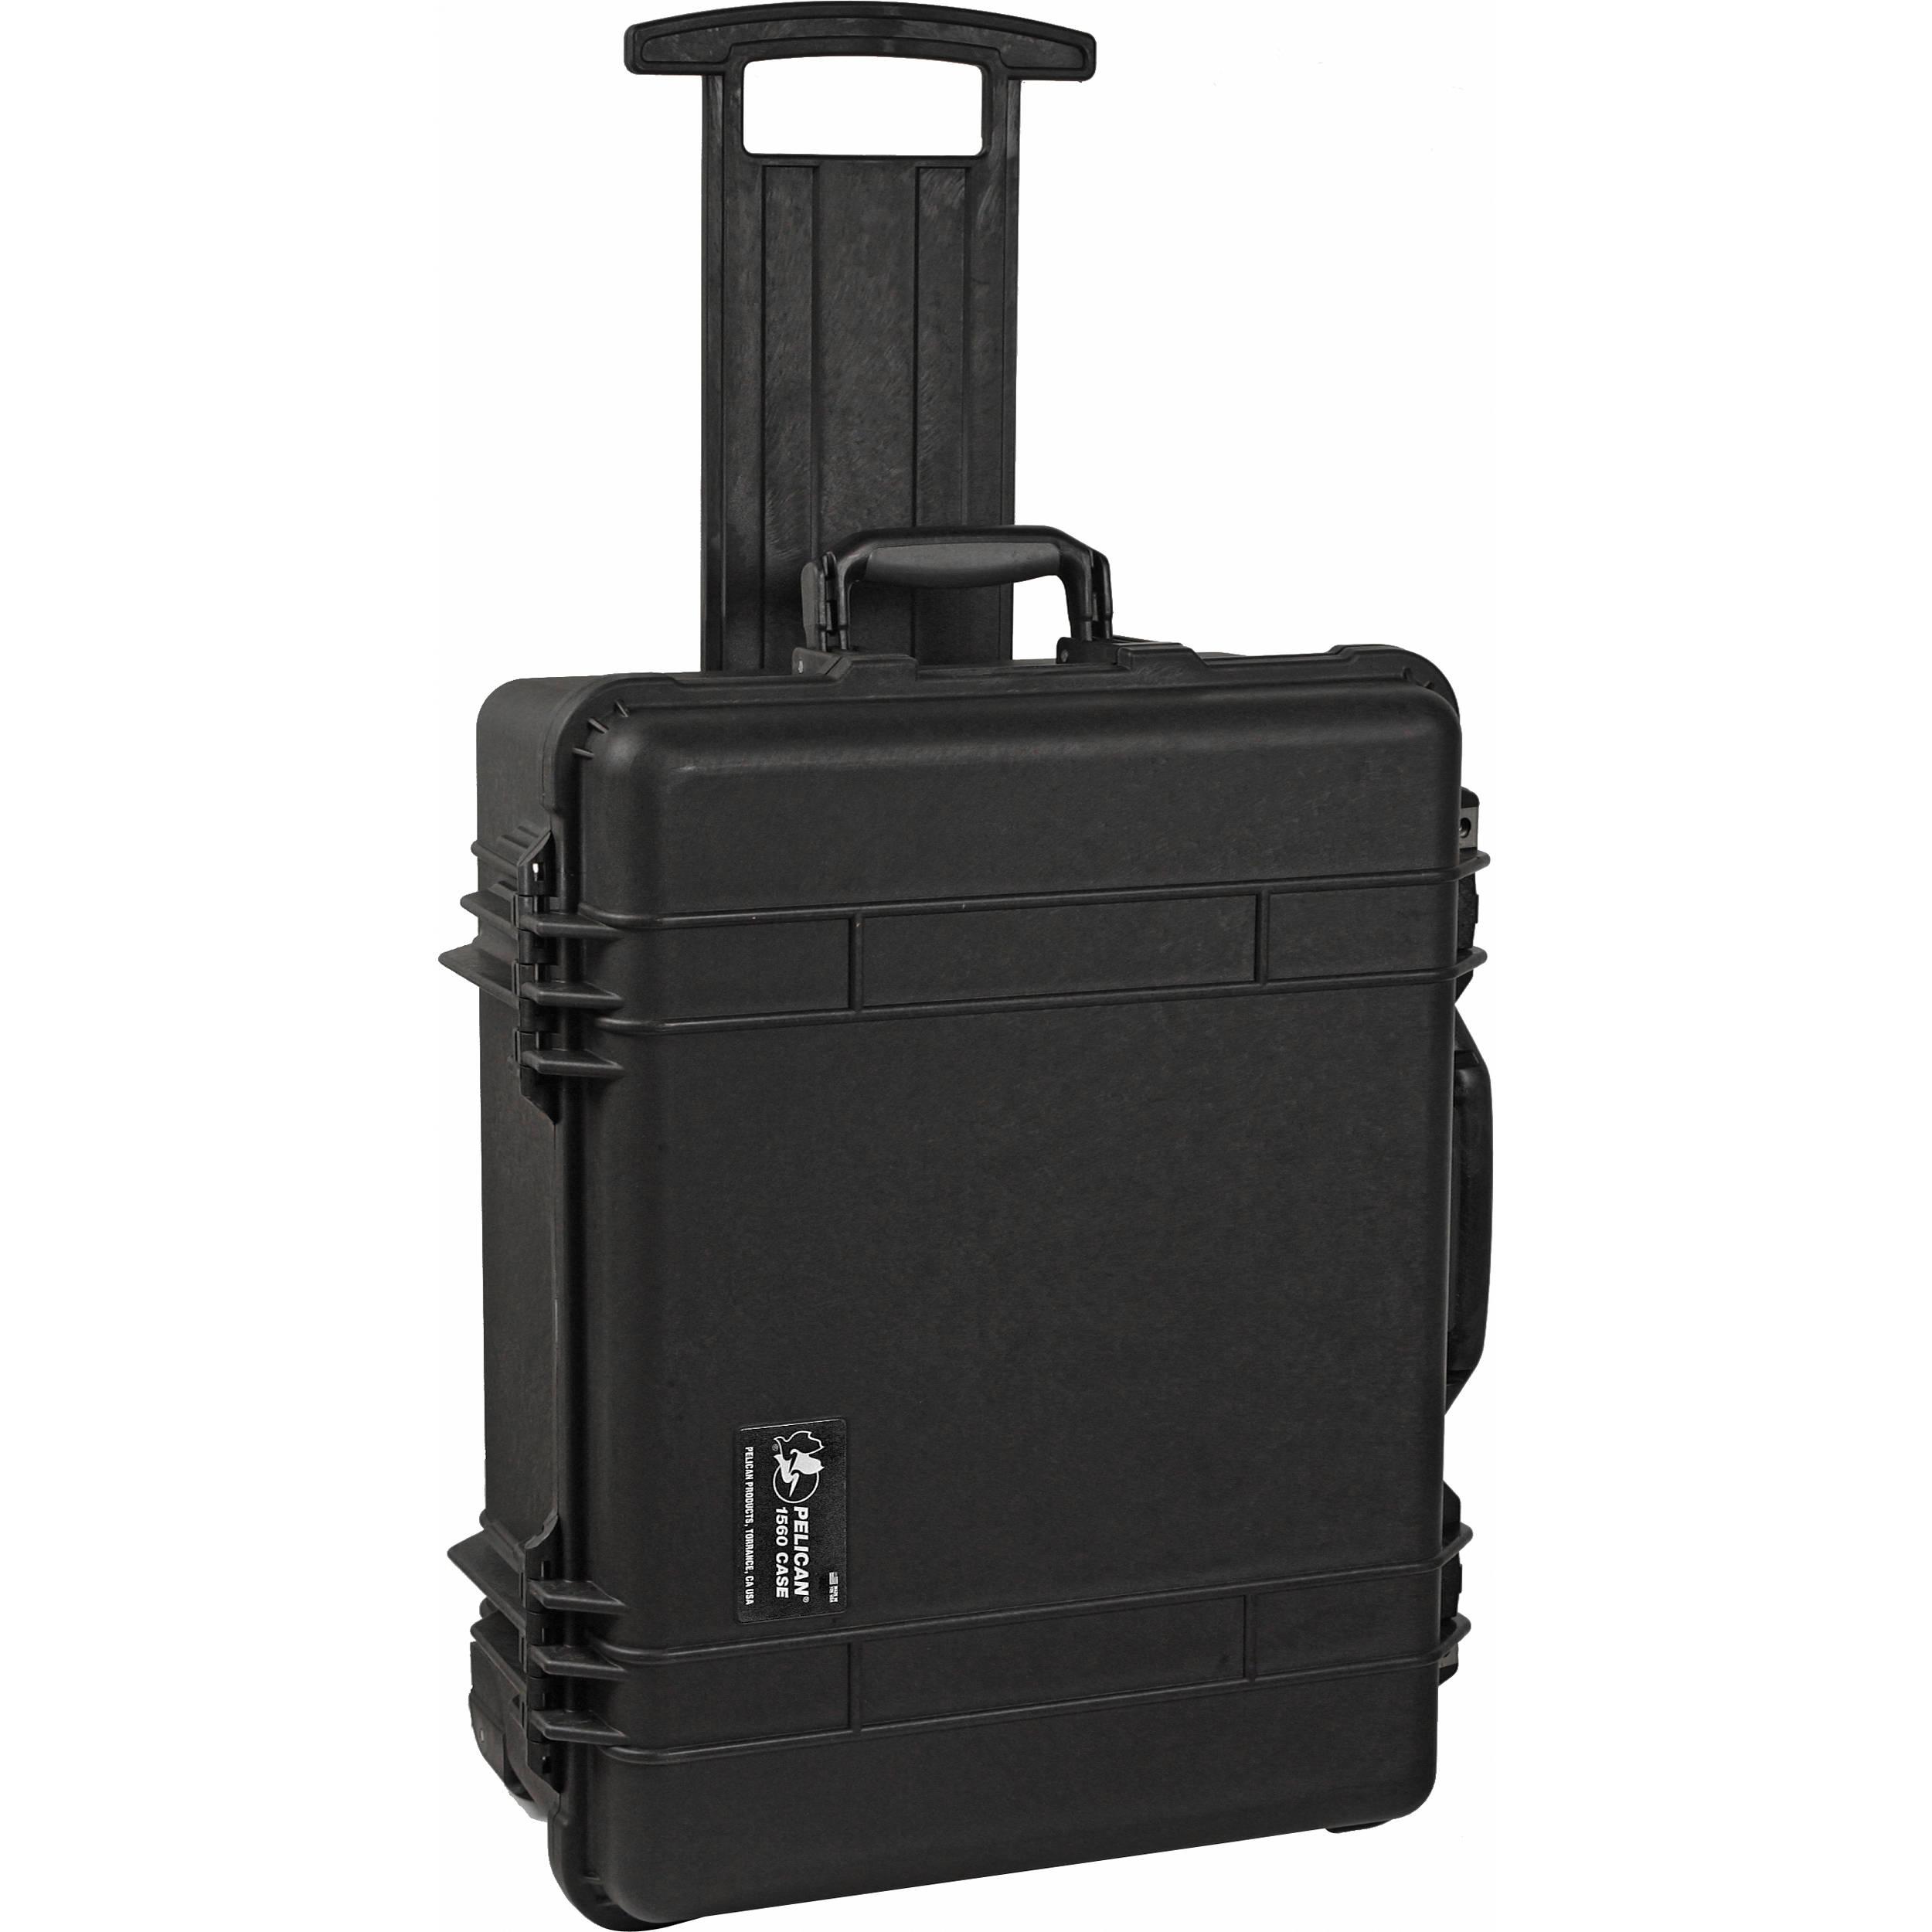 Betere Pelican 1560 Case with Foam Set (Black) 1560-000-110 B&H Photo CY-47